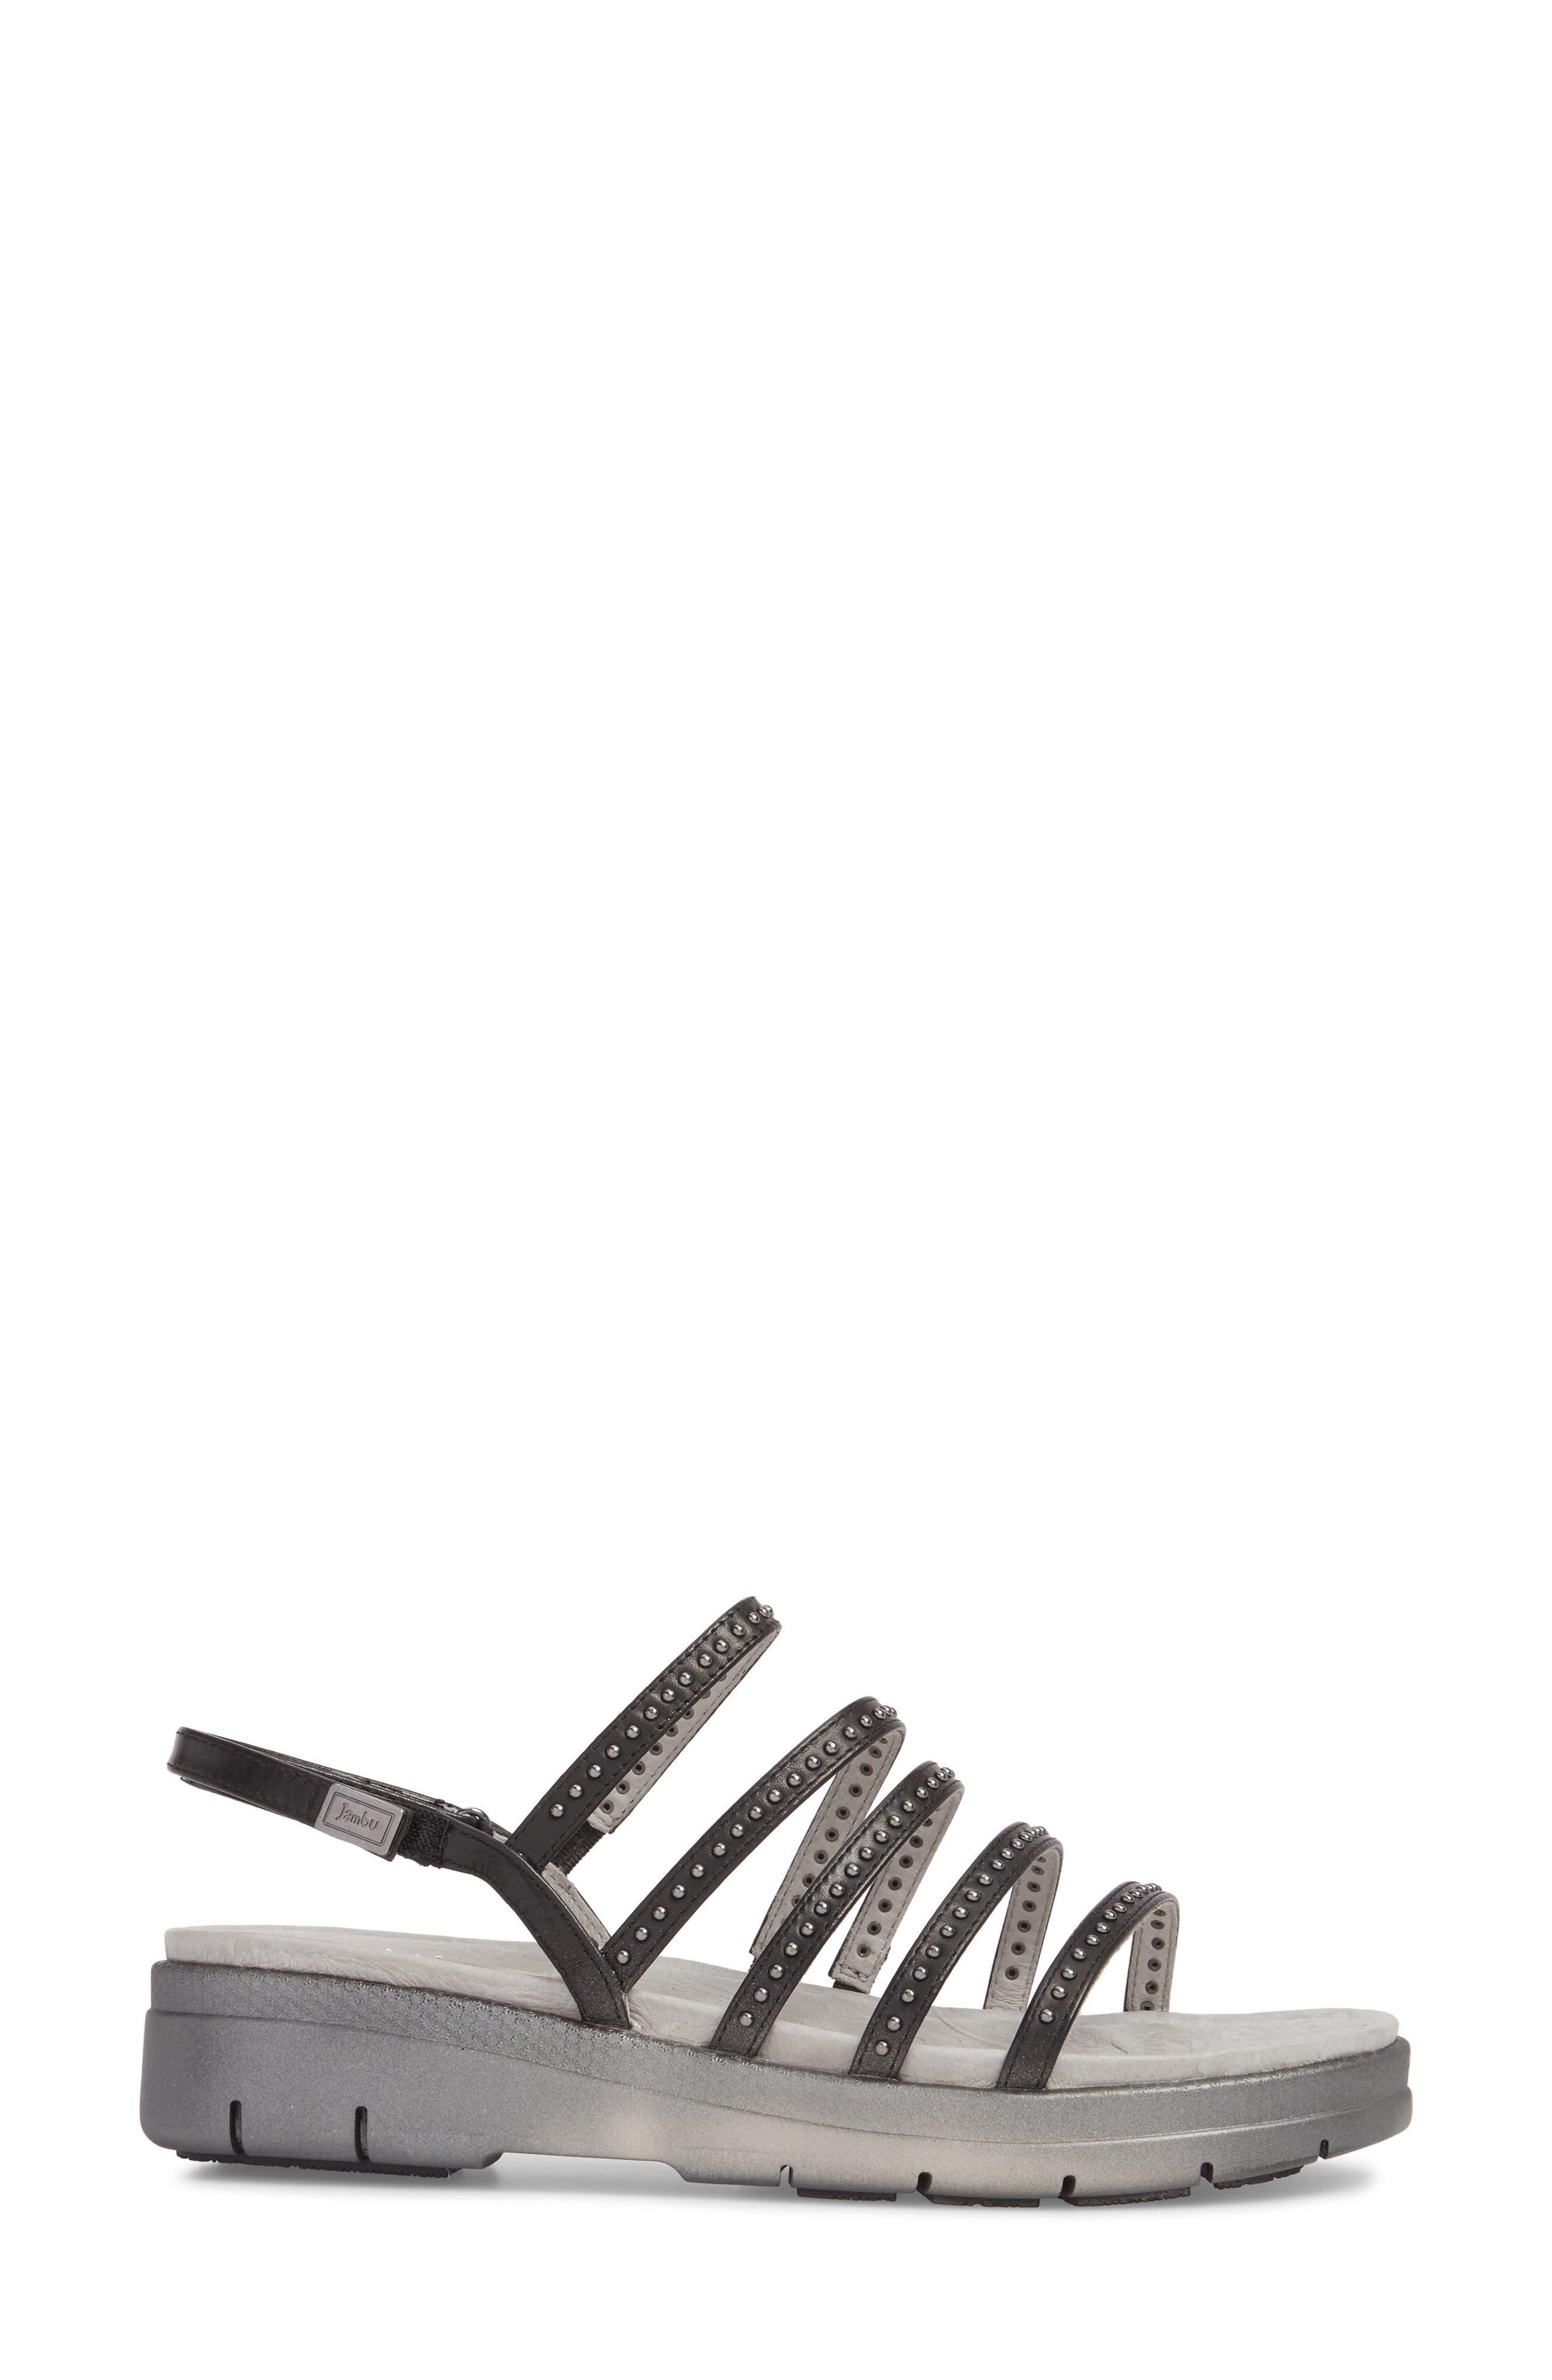 Elegance Studded Strappy Sandal,                             Alternate thumbnail 3, color,                             BLACK LEATHER